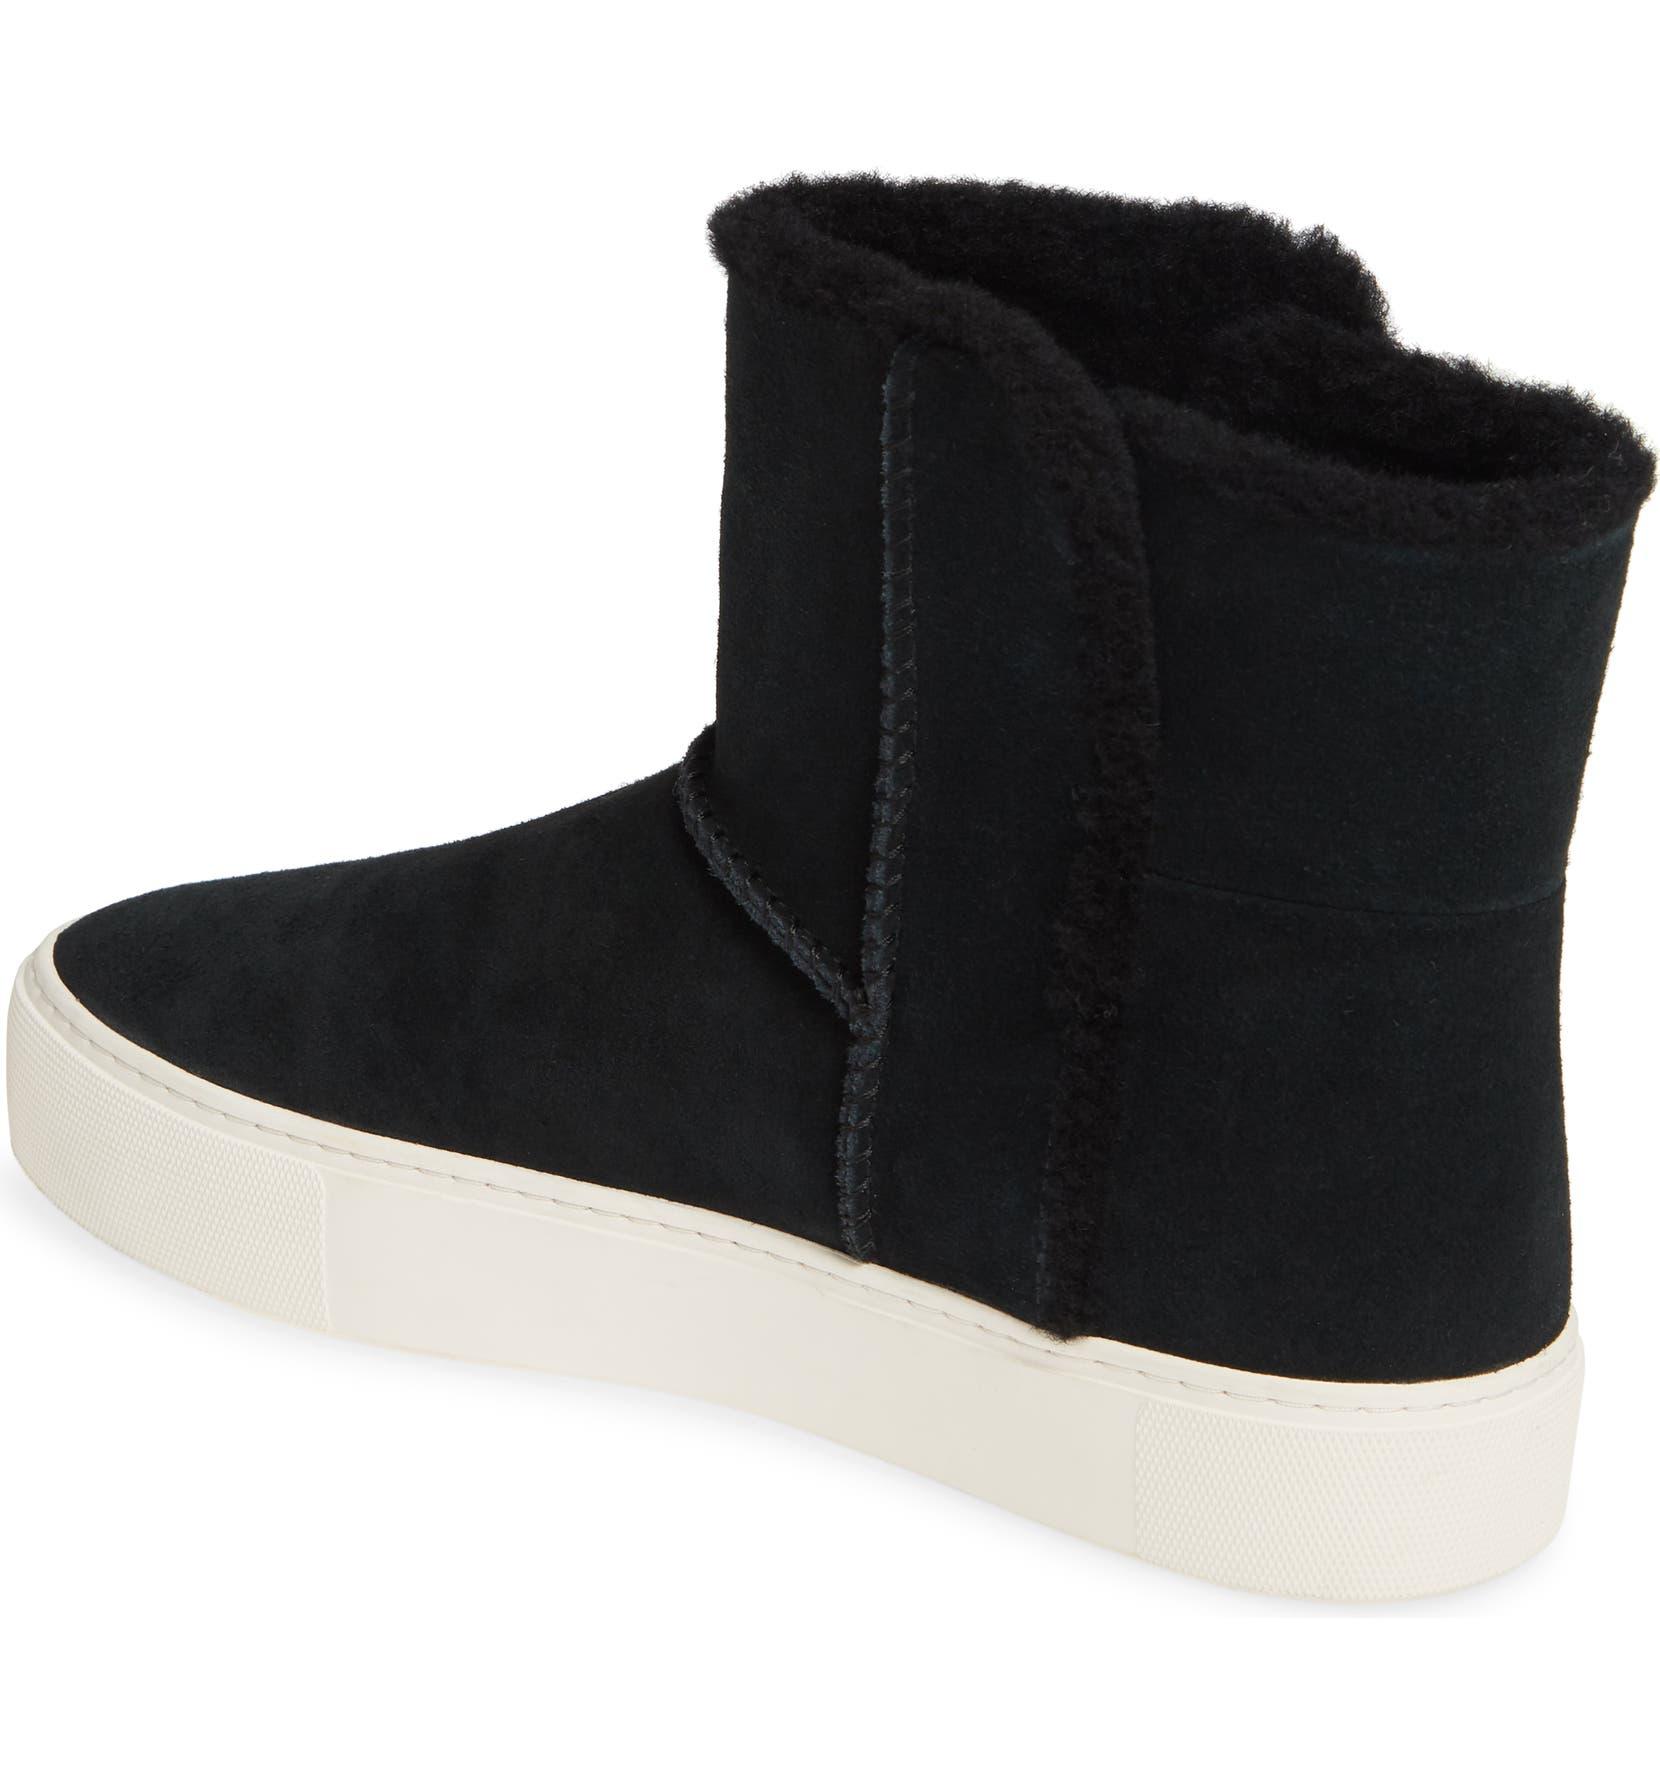 5f788ffc70c Priya Plush Sneaker Boot